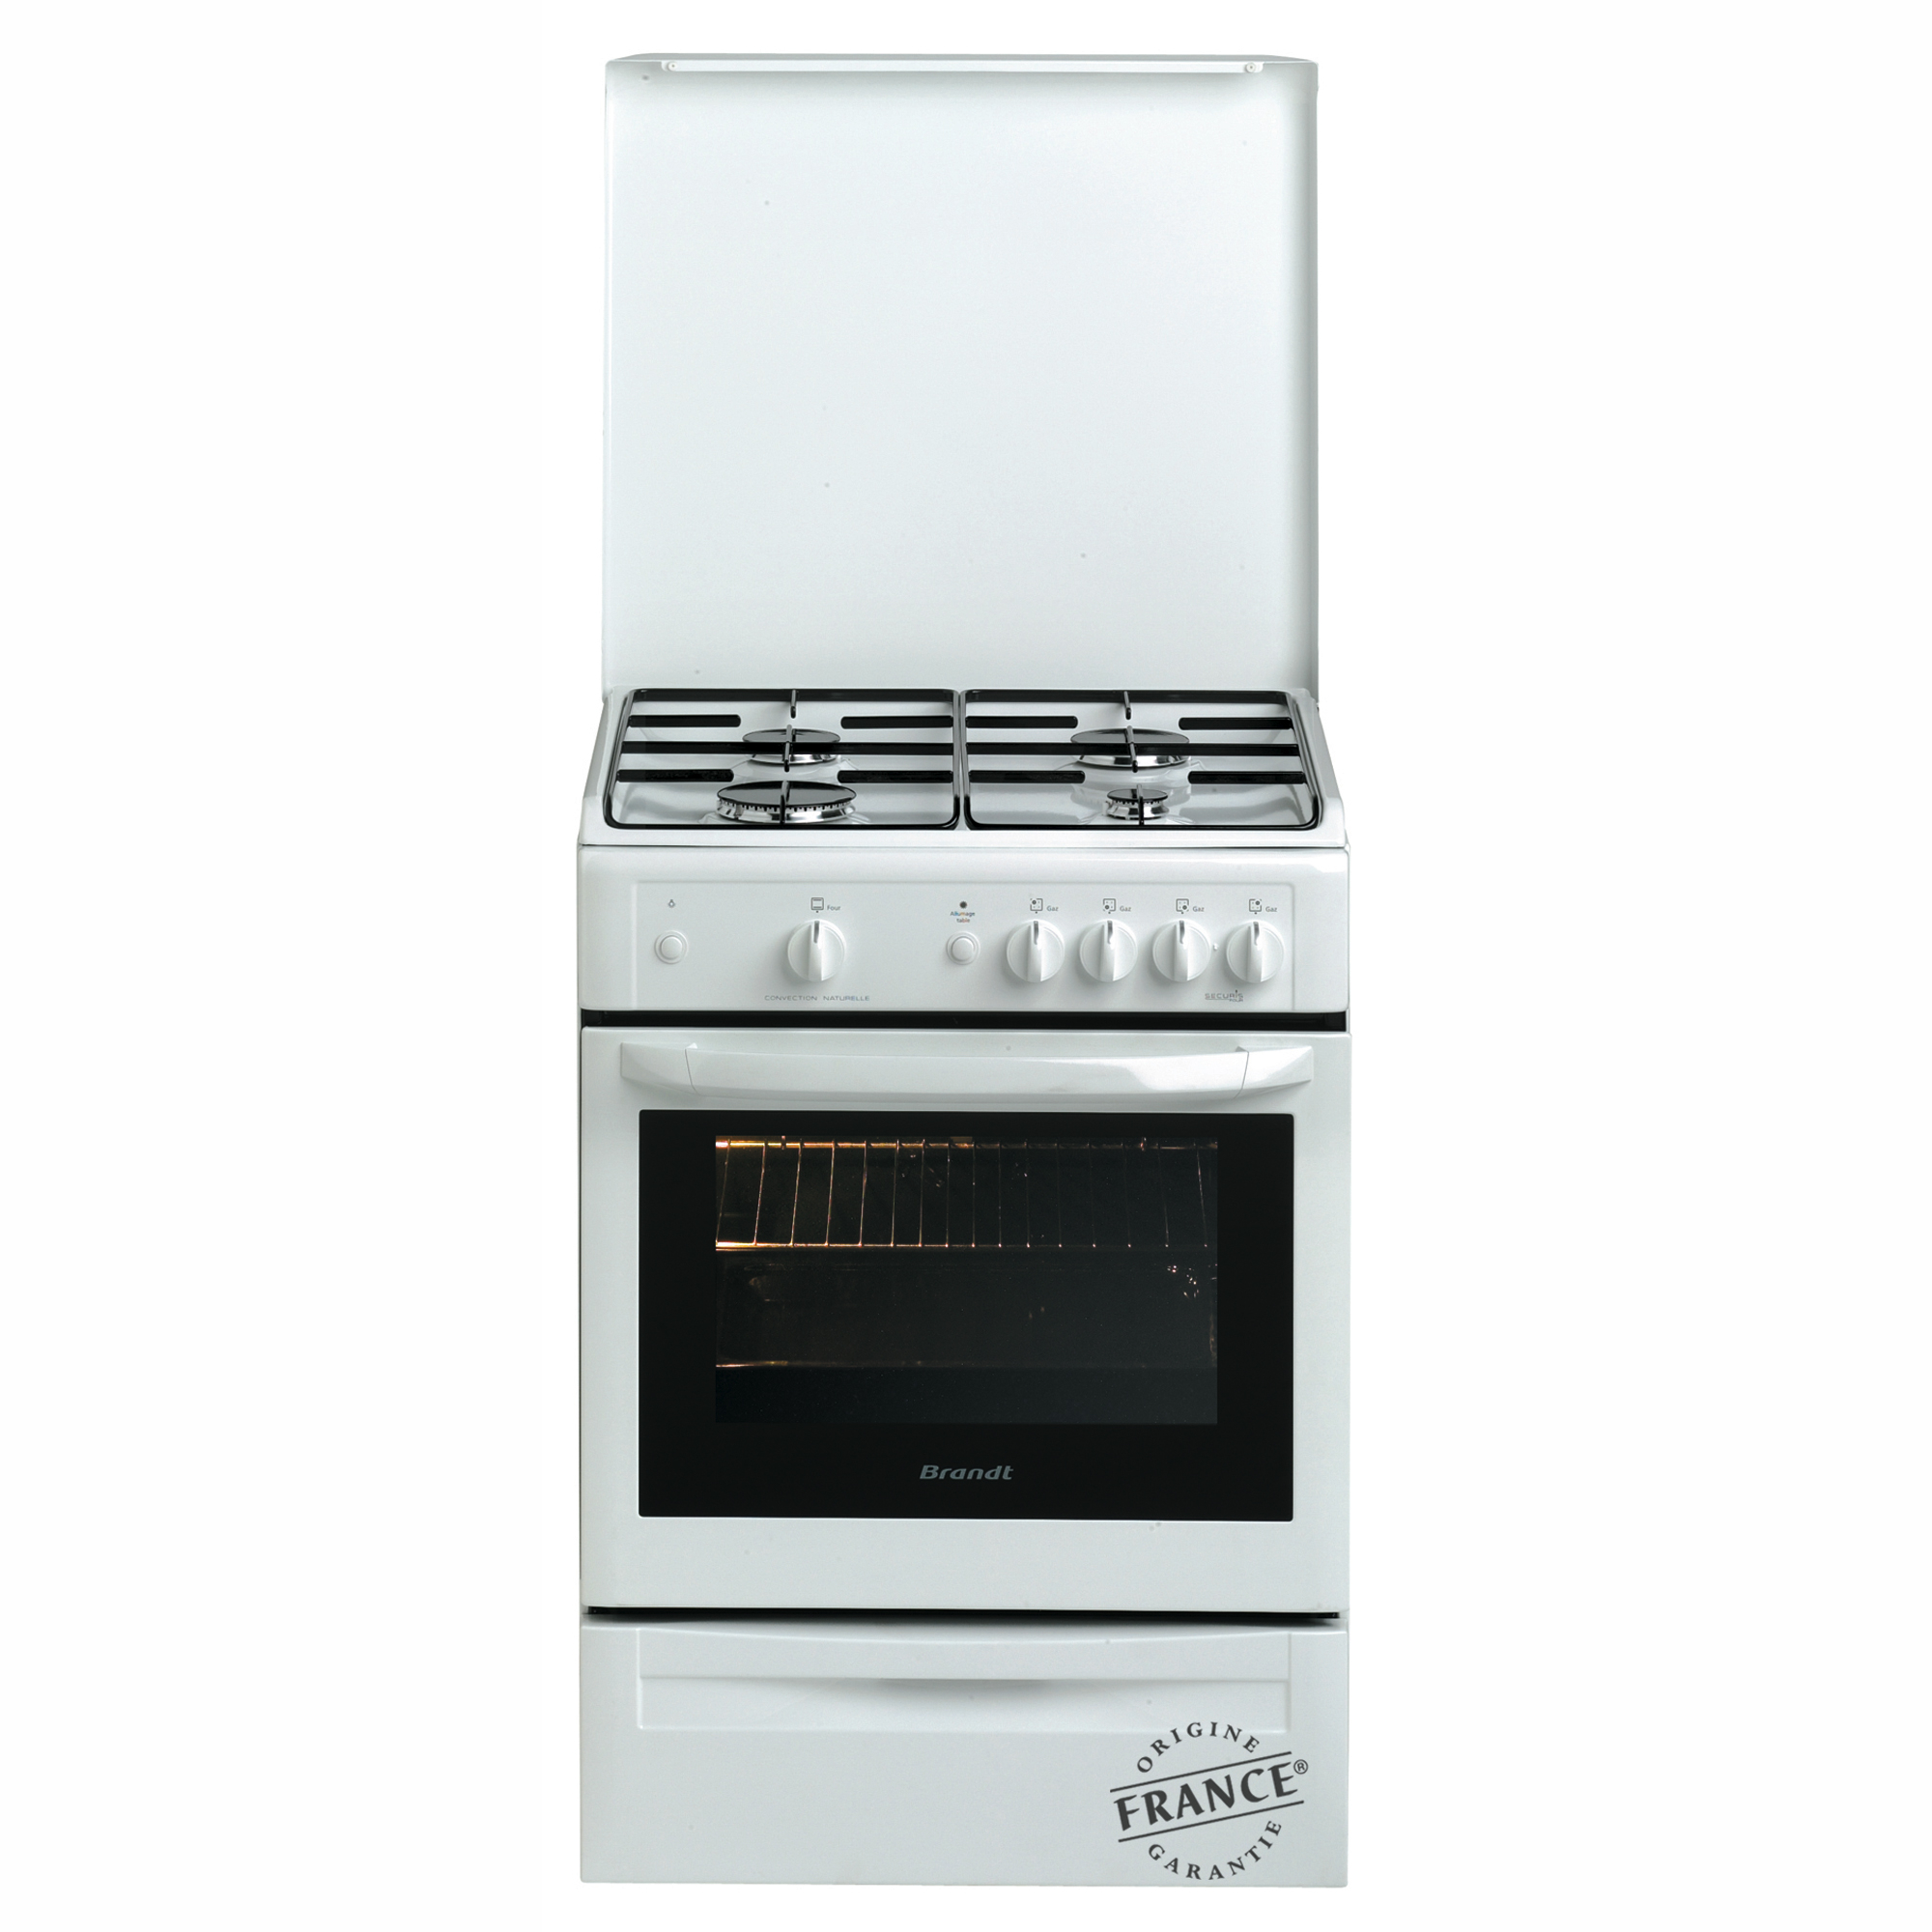 Brandt cuisini re gaz kge1000w - Cuisiniere a gaz ...